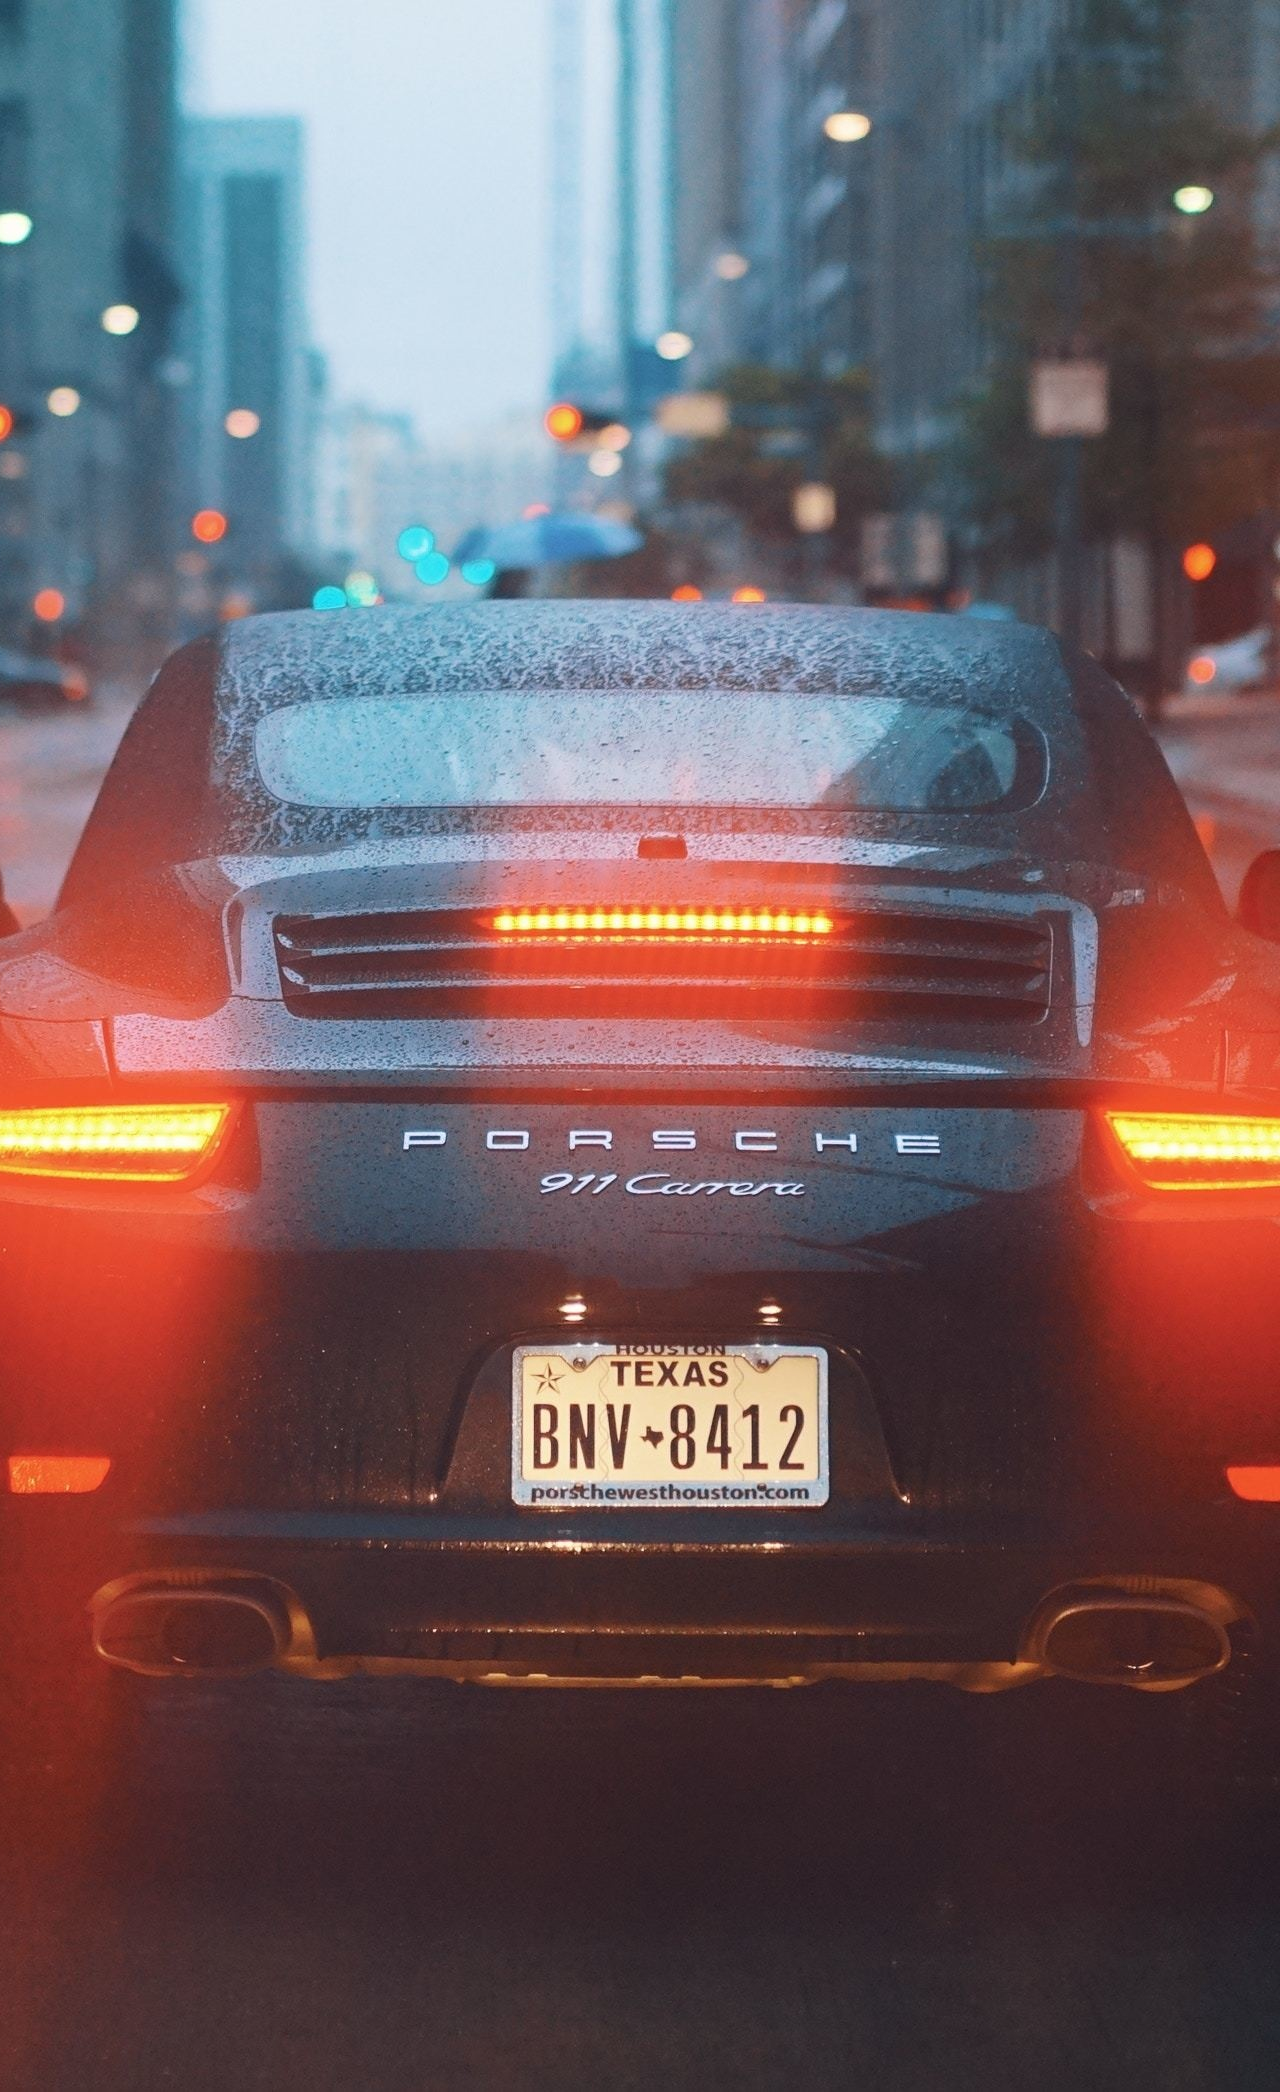 Download 1280x2120 Wallpaper Porsche 911 Carrera S Rear On